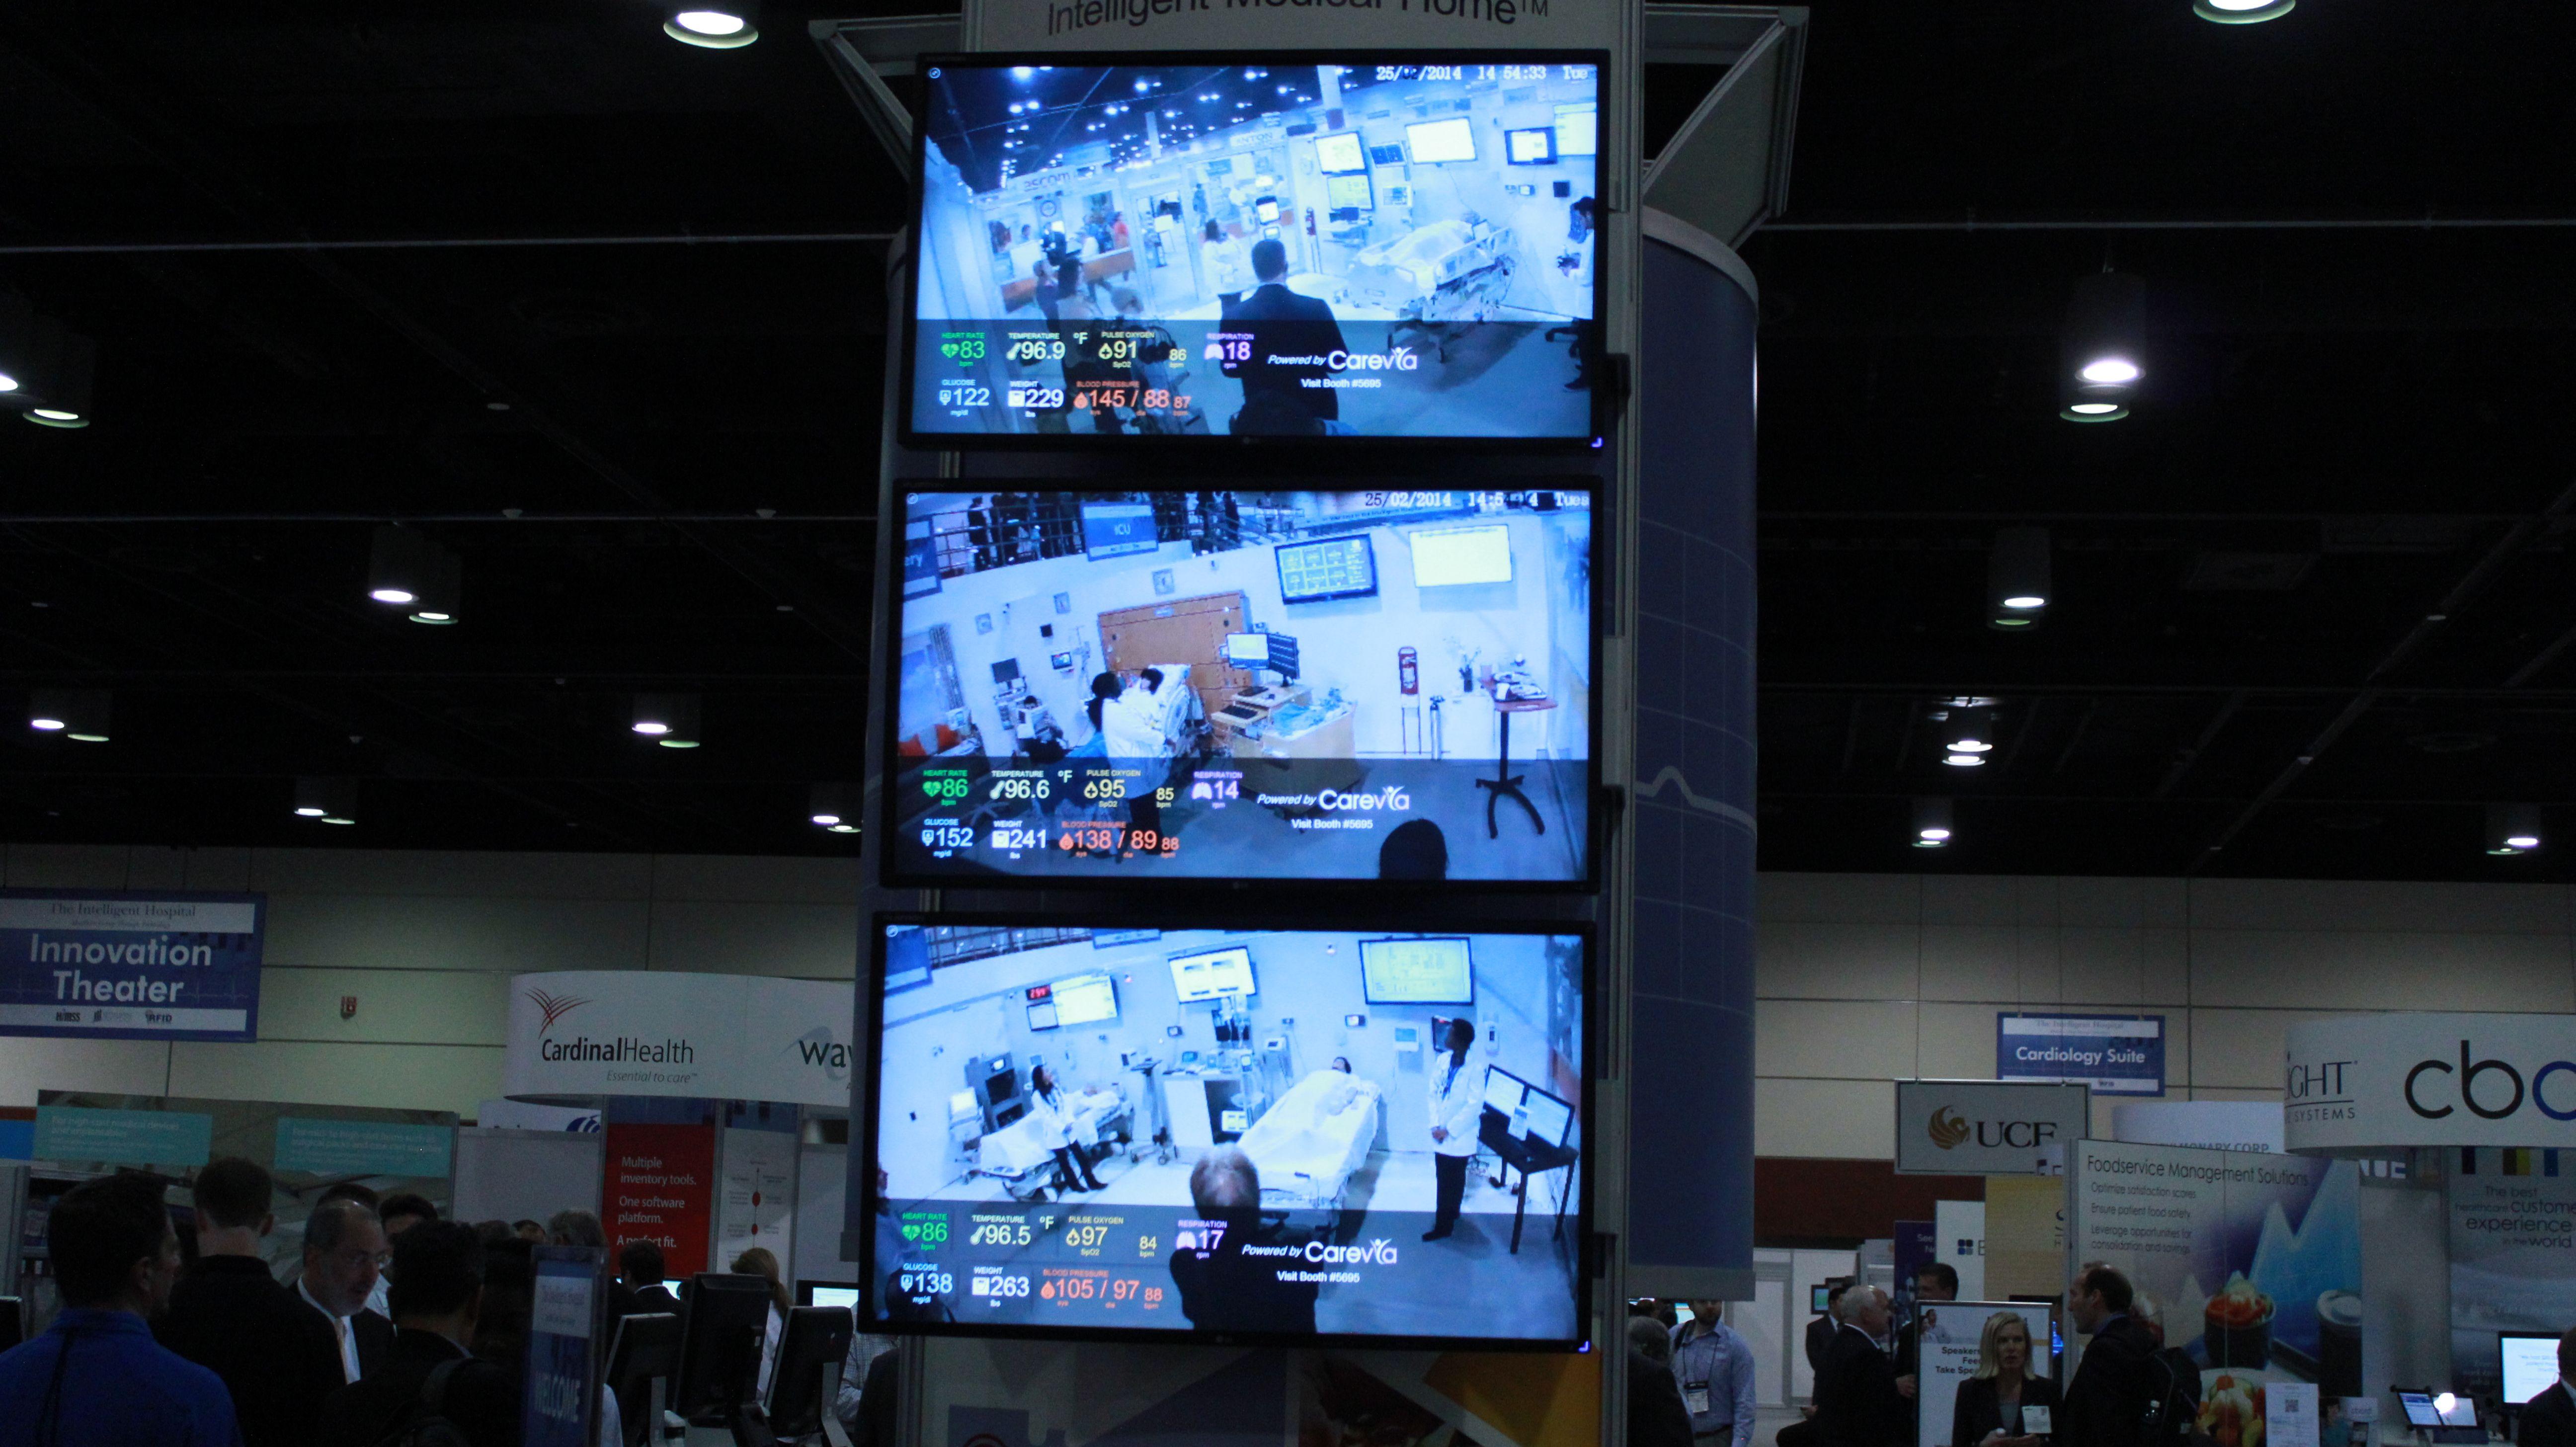 Monitors in the intelligent hospital pavilion